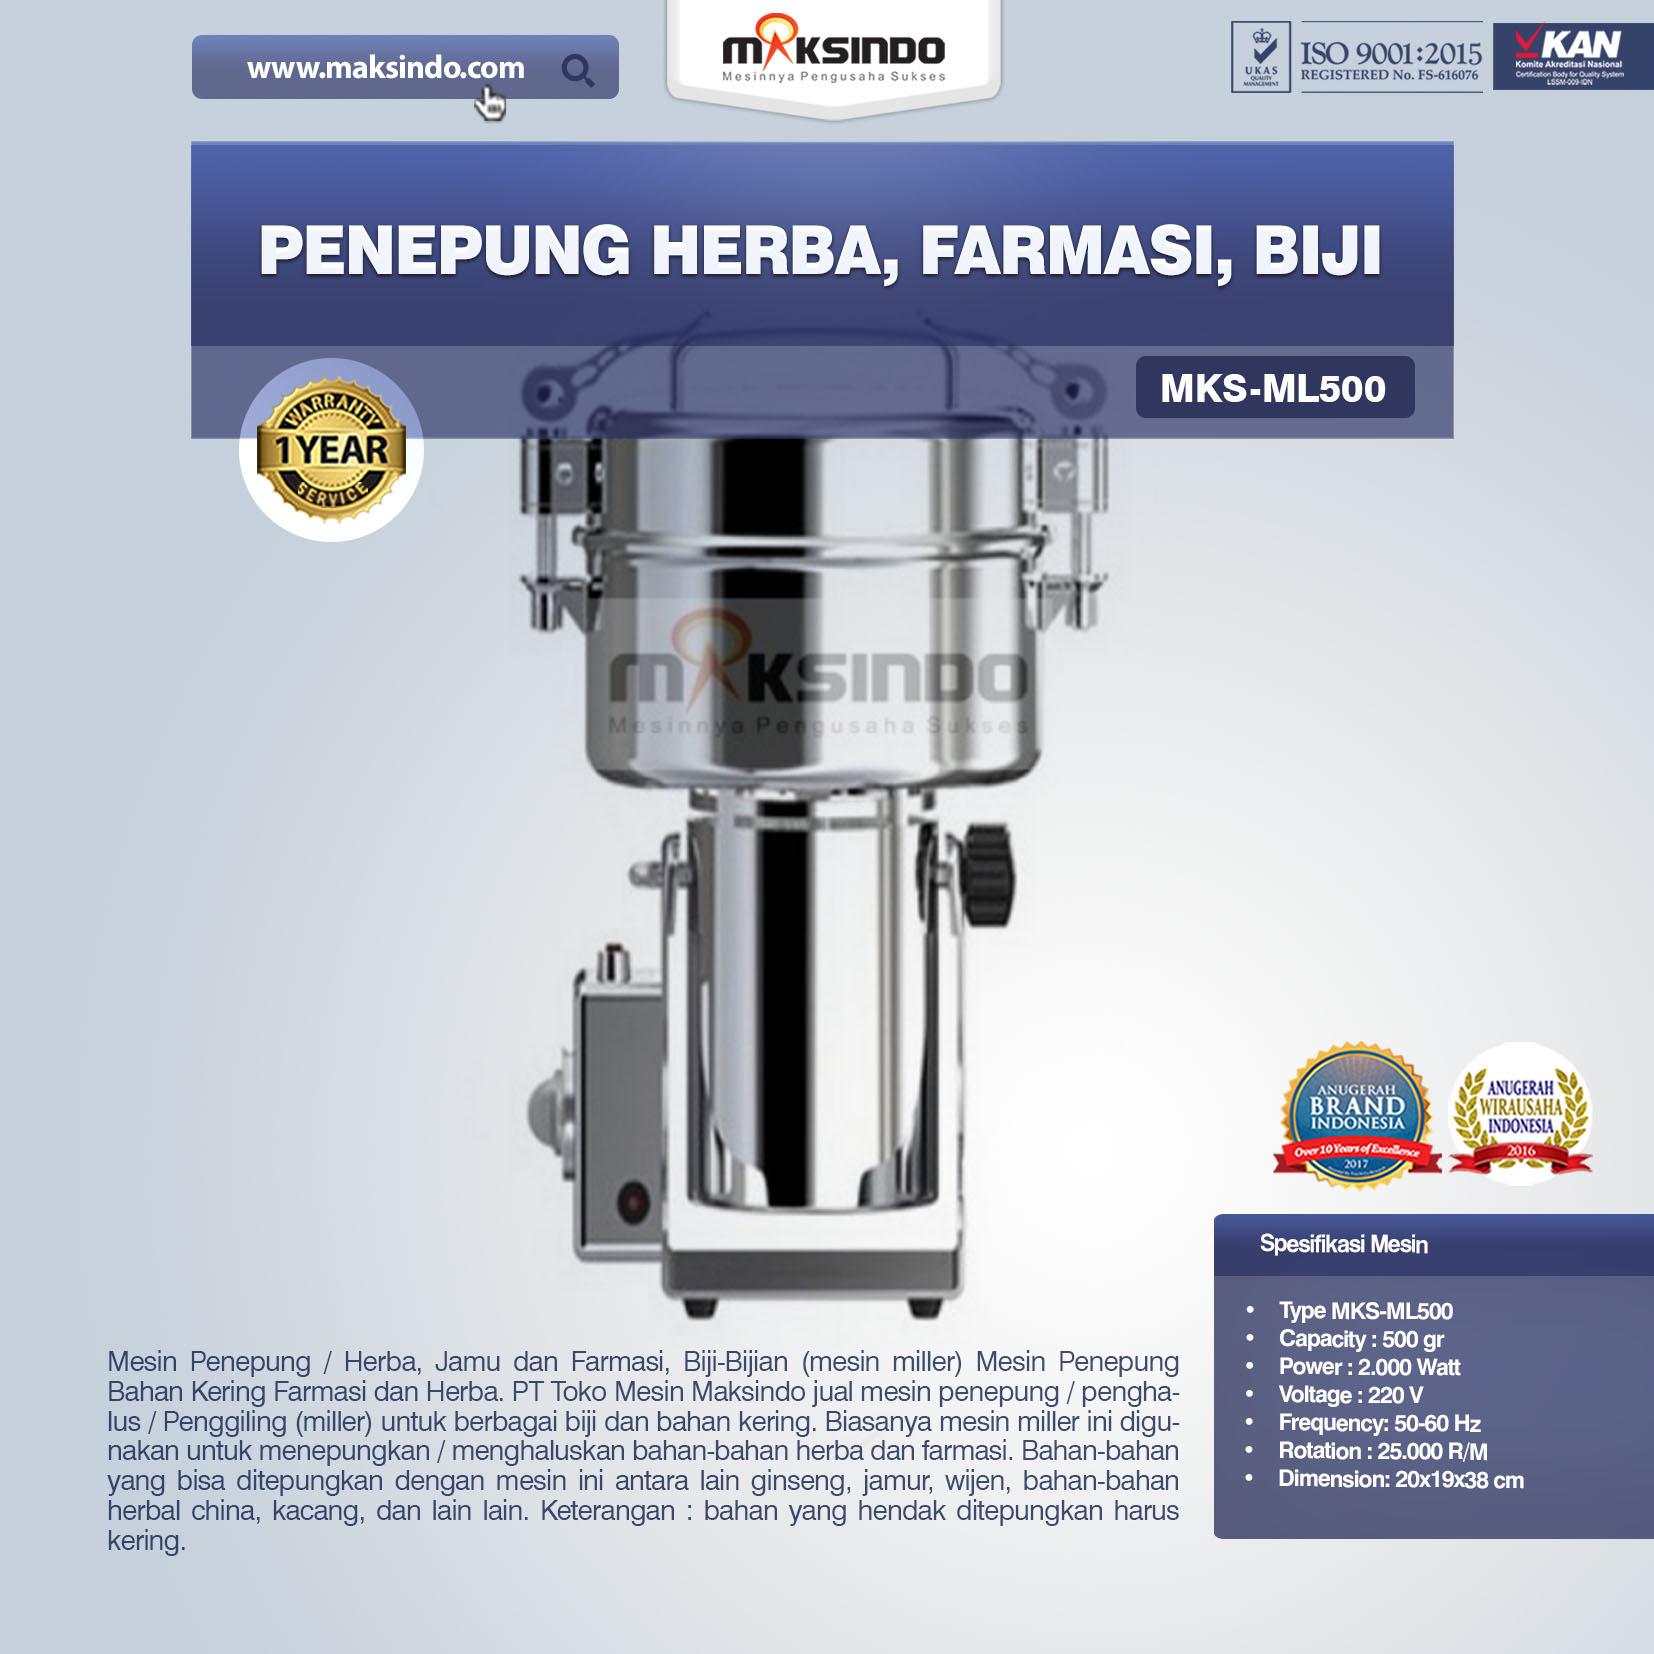 Jual Penepung Herba, Farmasi, Biji (ML500) di Yogyakarta